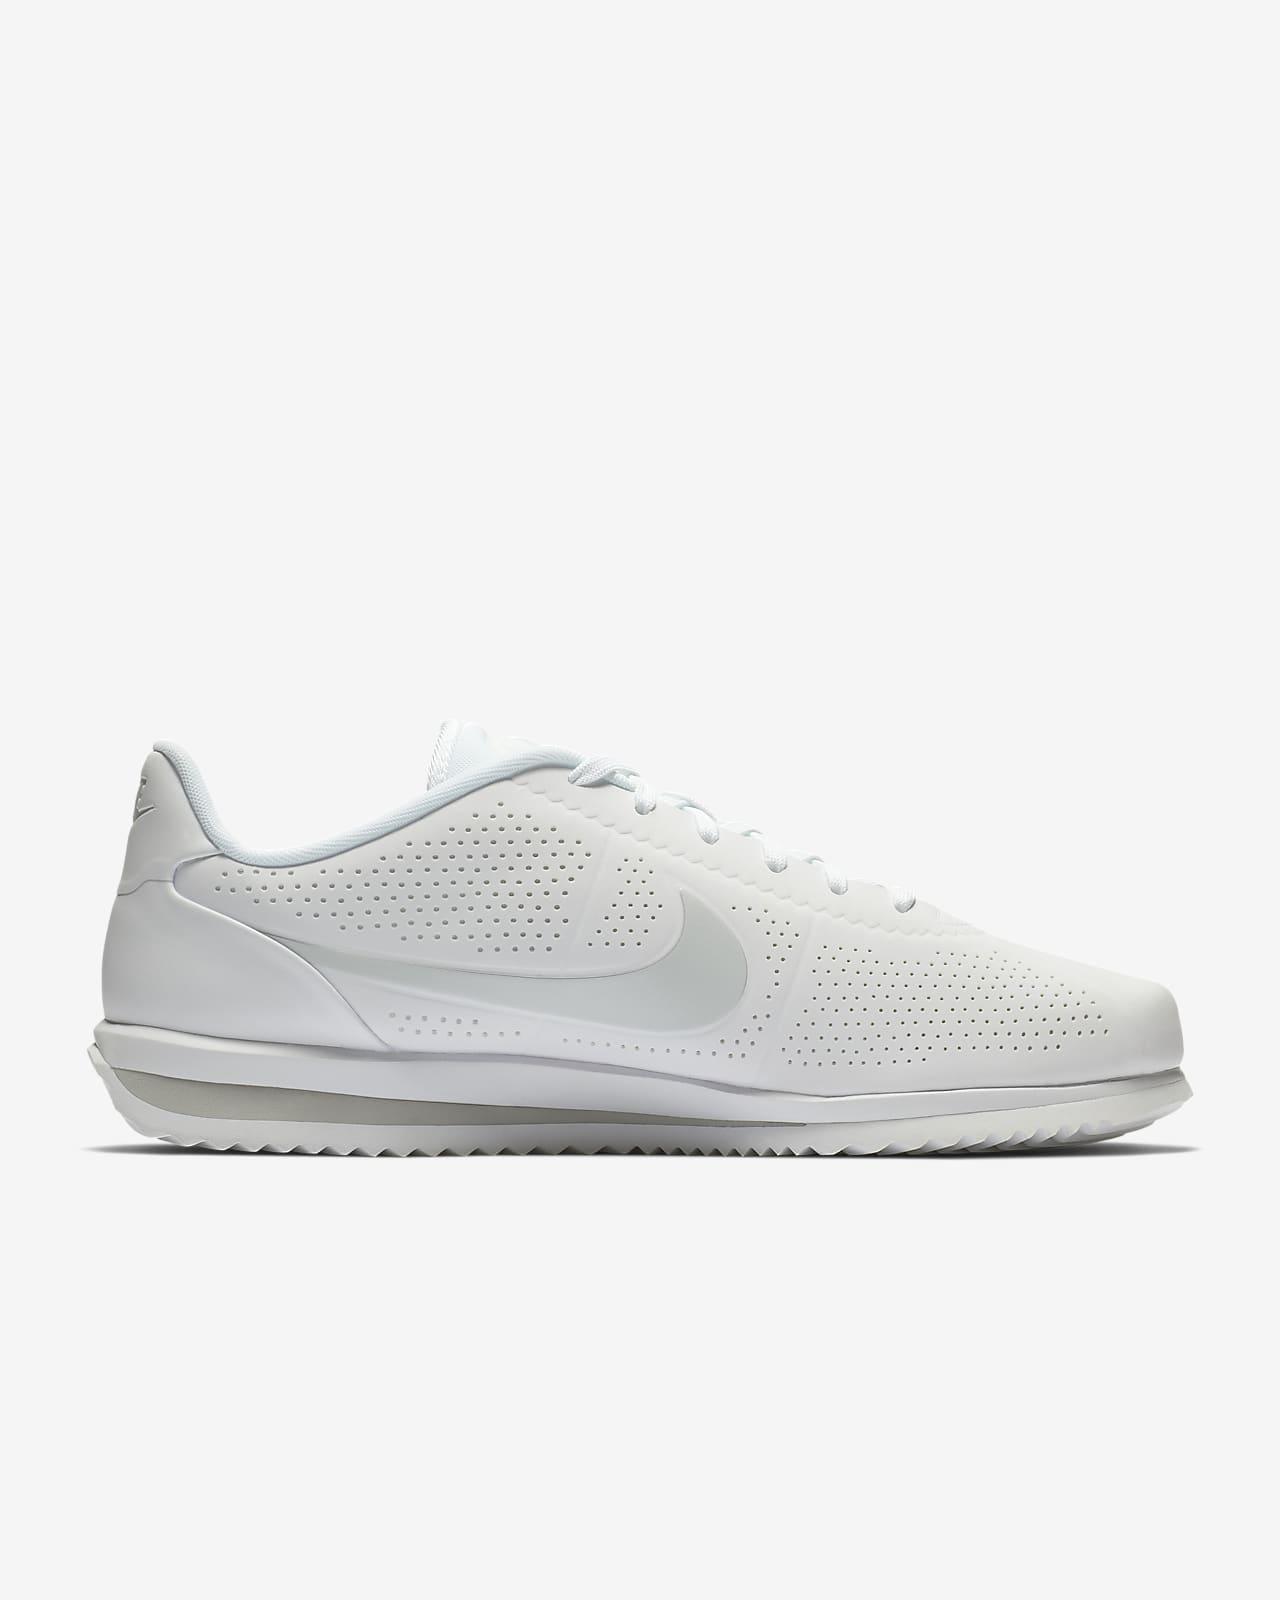 Nike Cortez Ultra Moire Men's Shoe. Nike LU